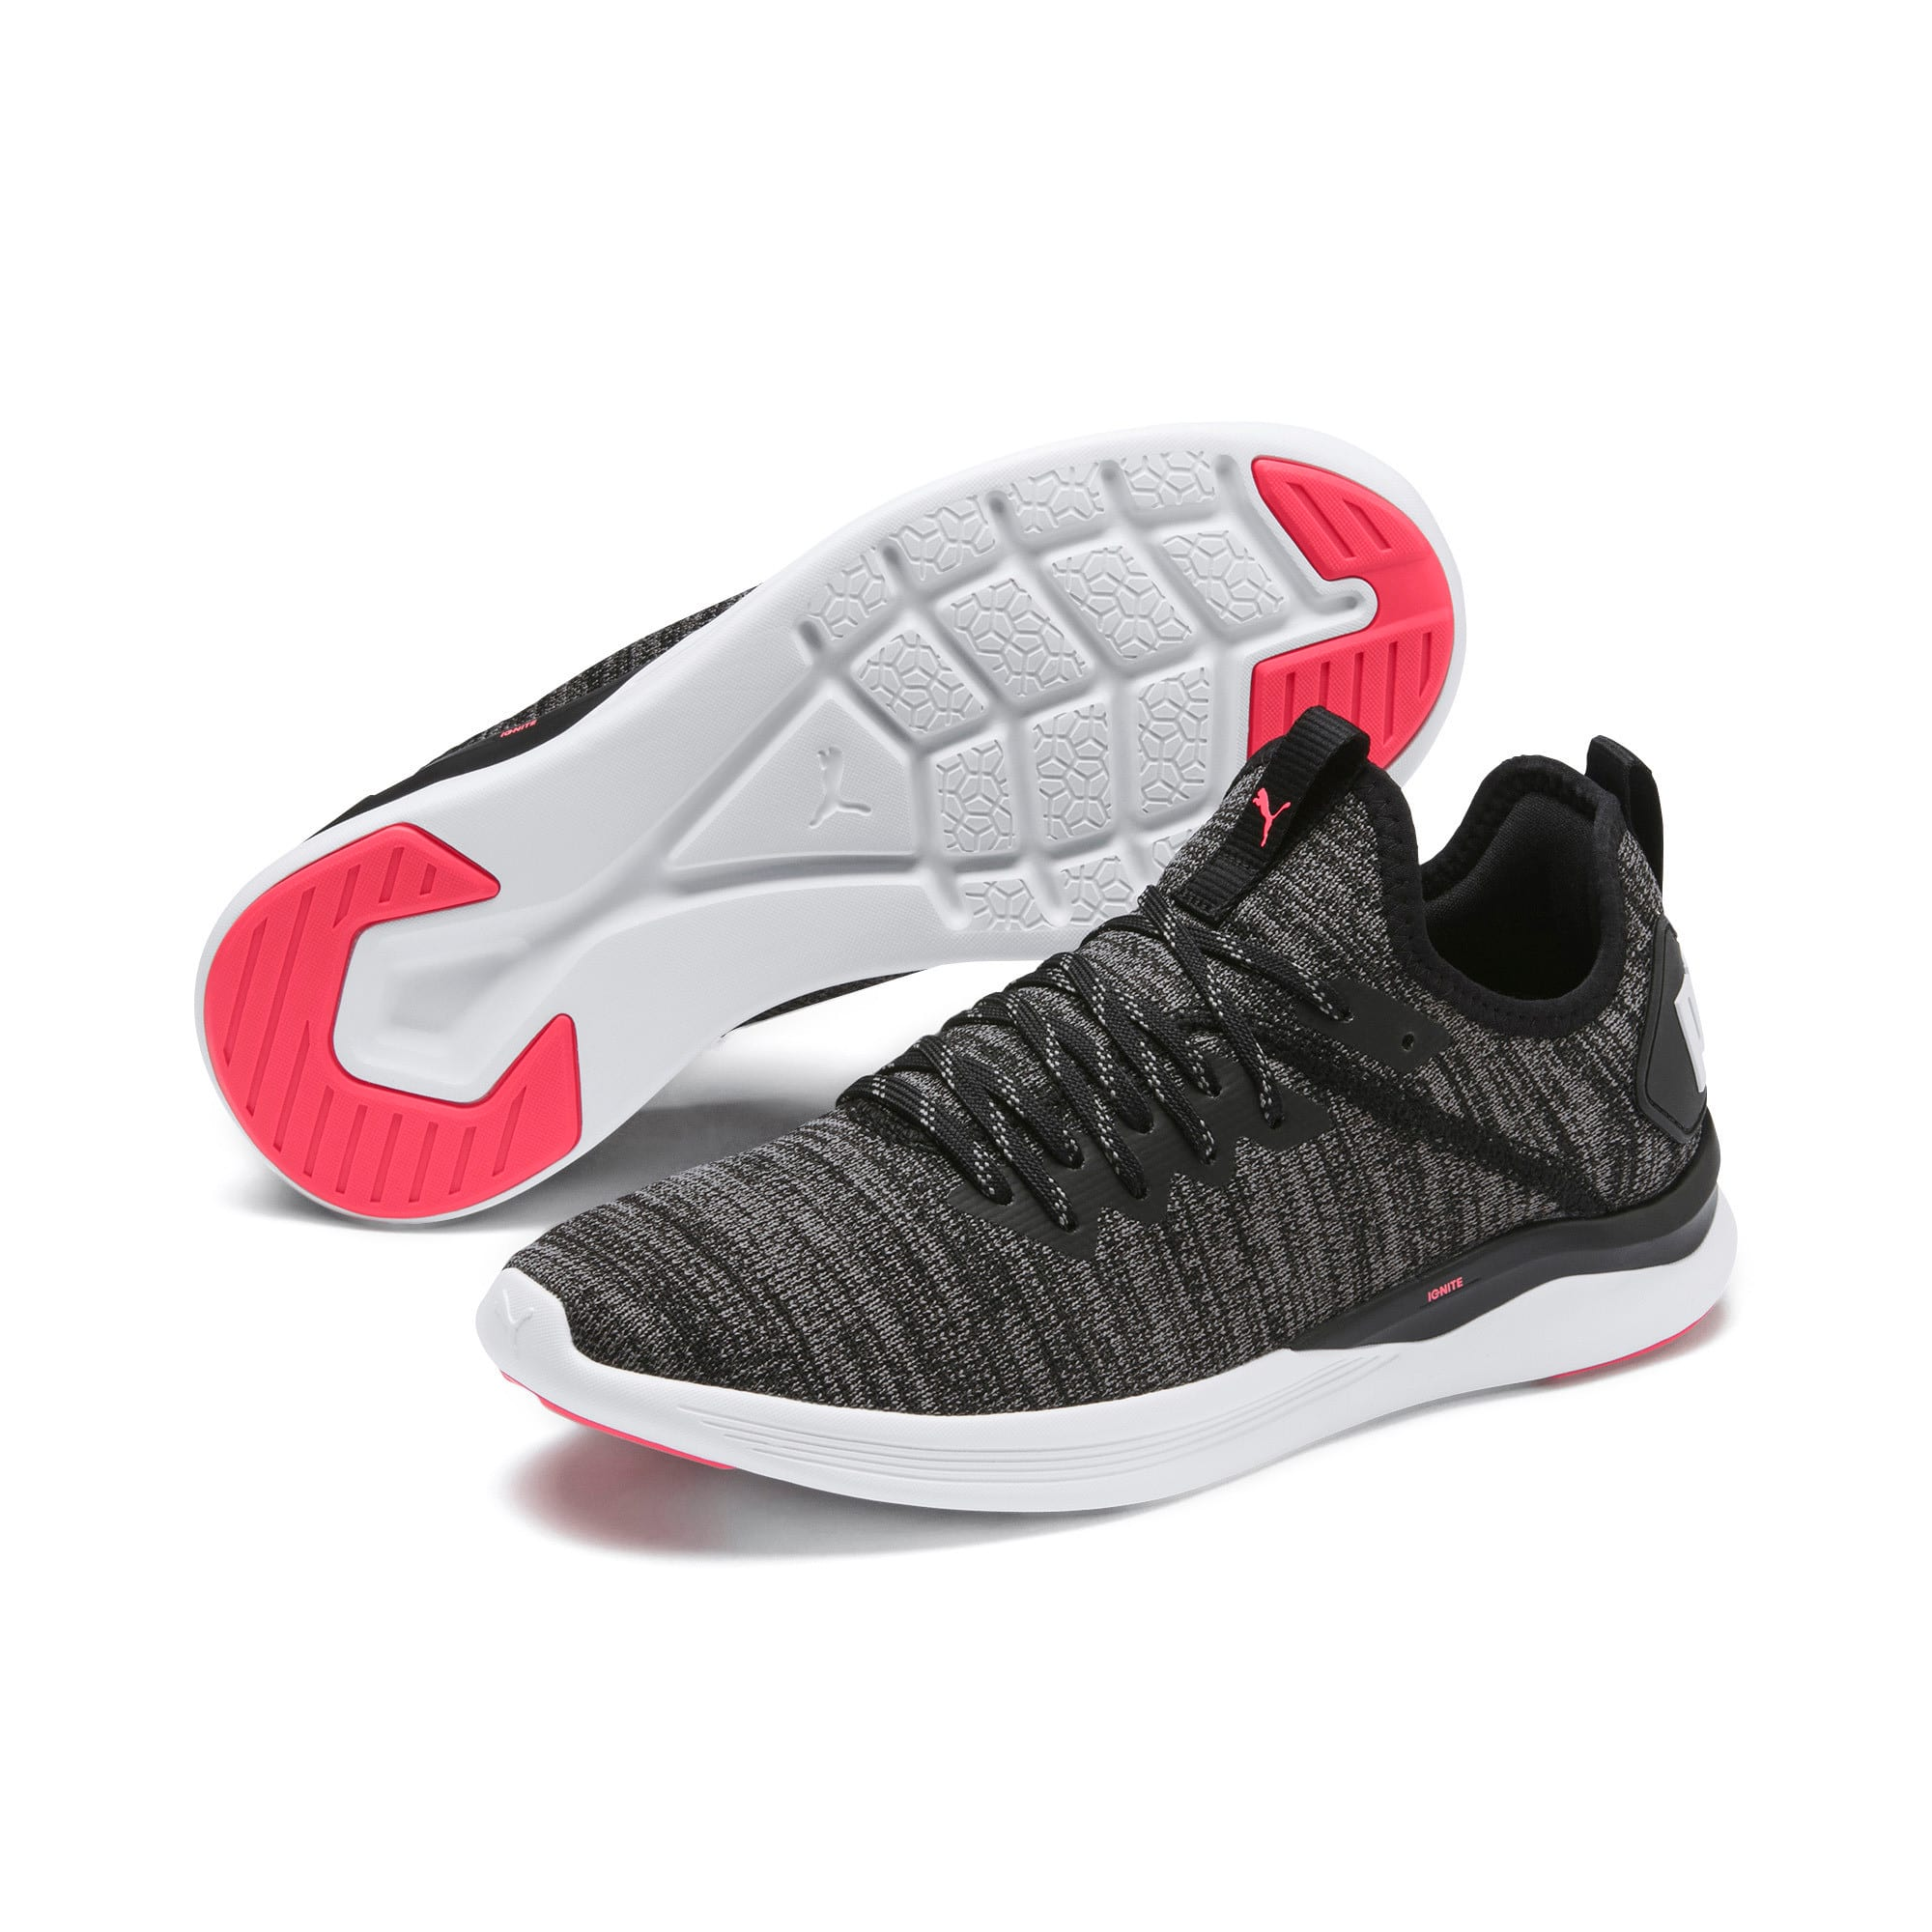 Thumbnail 3 of IGNITE Flash evoKNIT Women's Running Shoes, Black-White-Pink Alert, medium